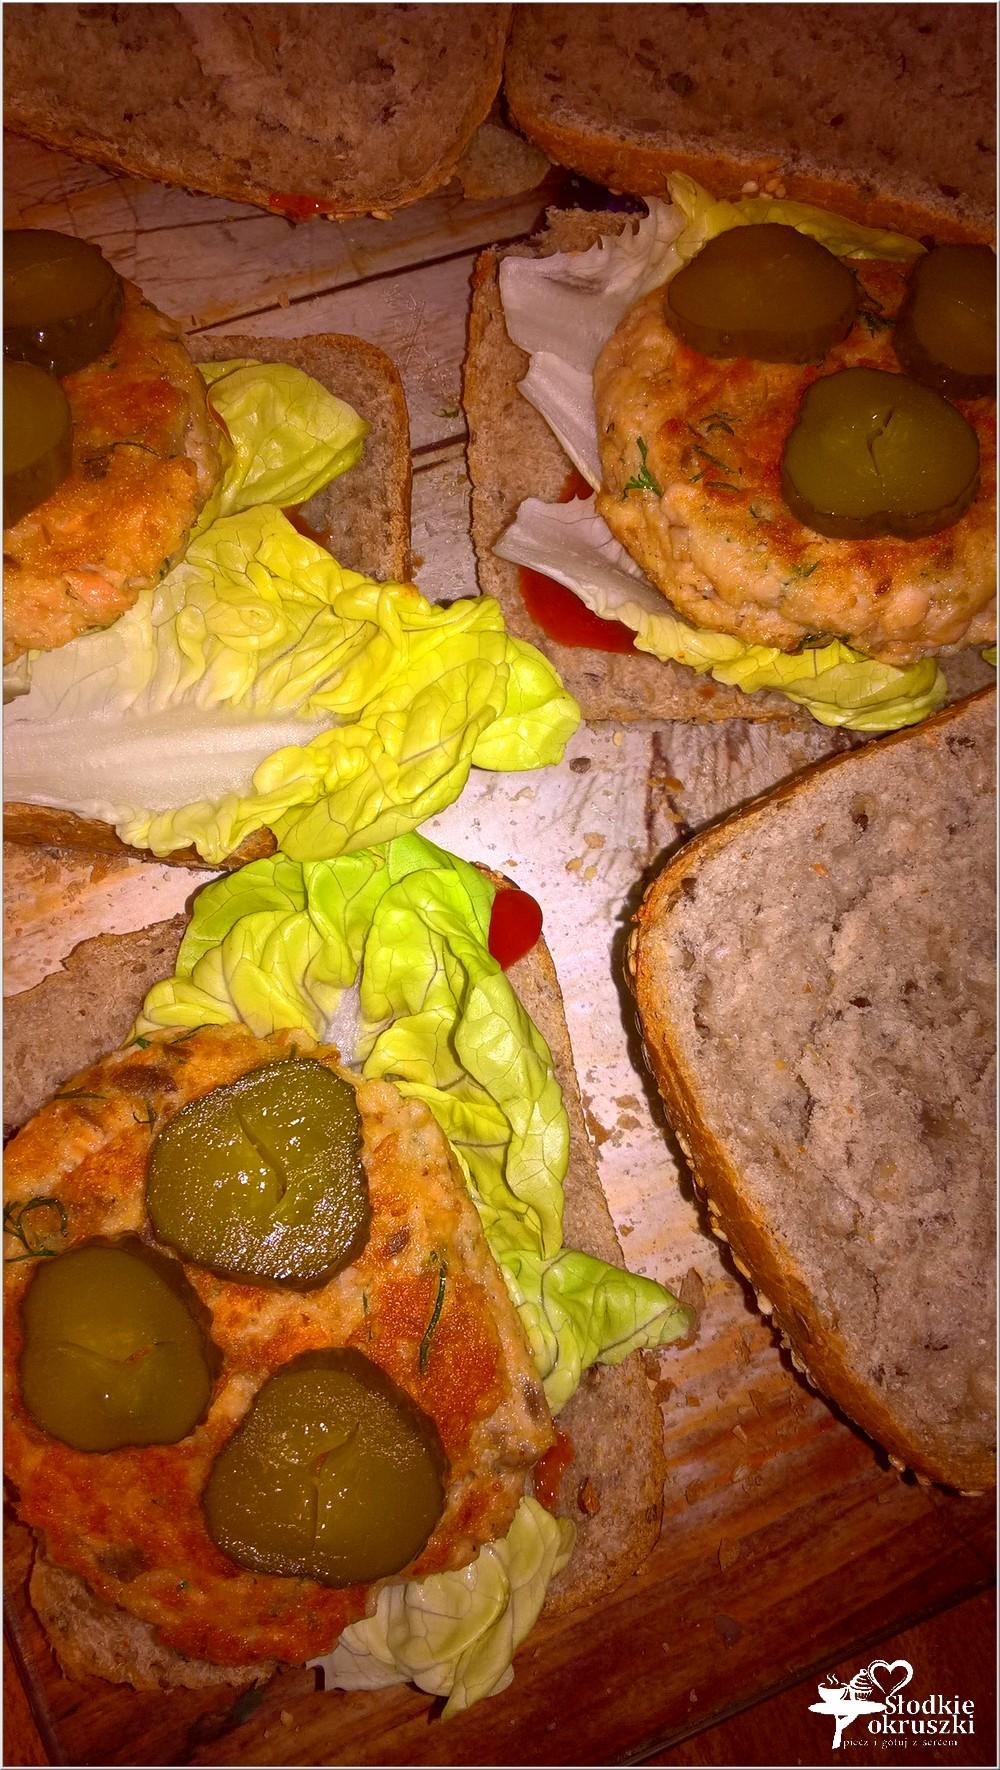 zdrowe-burgery-rybne-z-kotletem-z-lososia-5